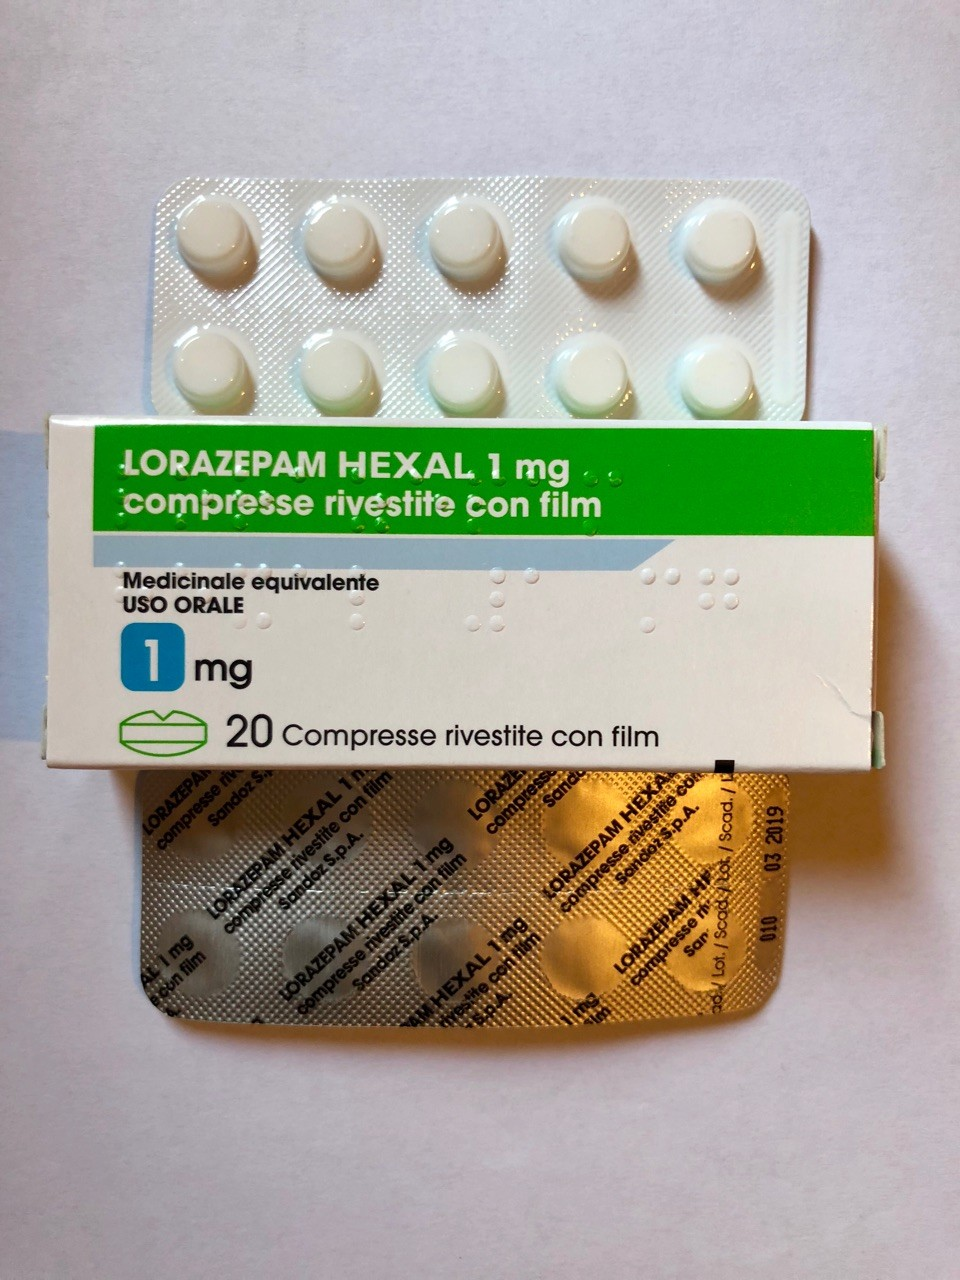 Alprazolam 1 mg